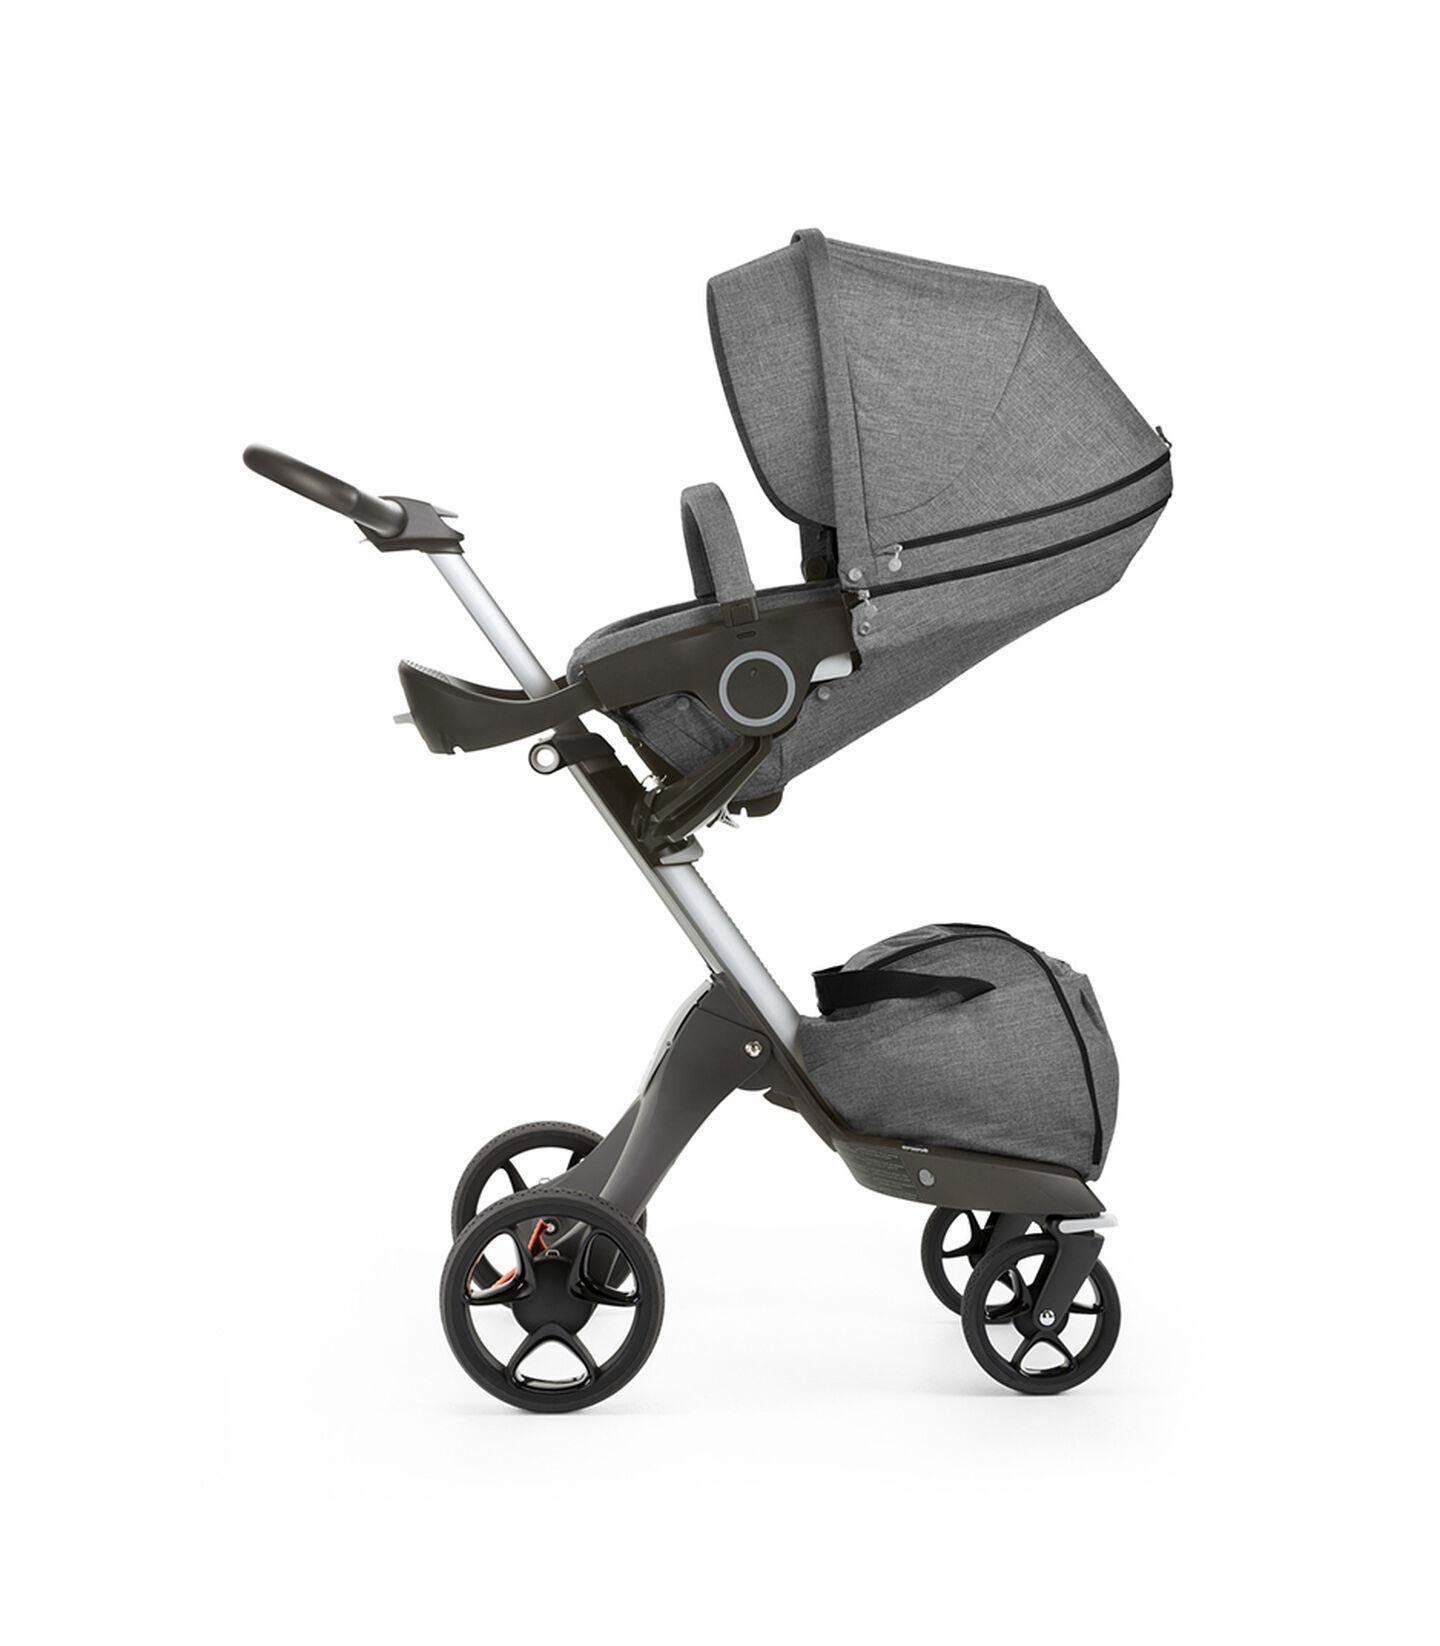 Stokke® Xplory® with Stokke® Stroller Seat, parent facing, sleep position. Black Melange. New wheels 2016.